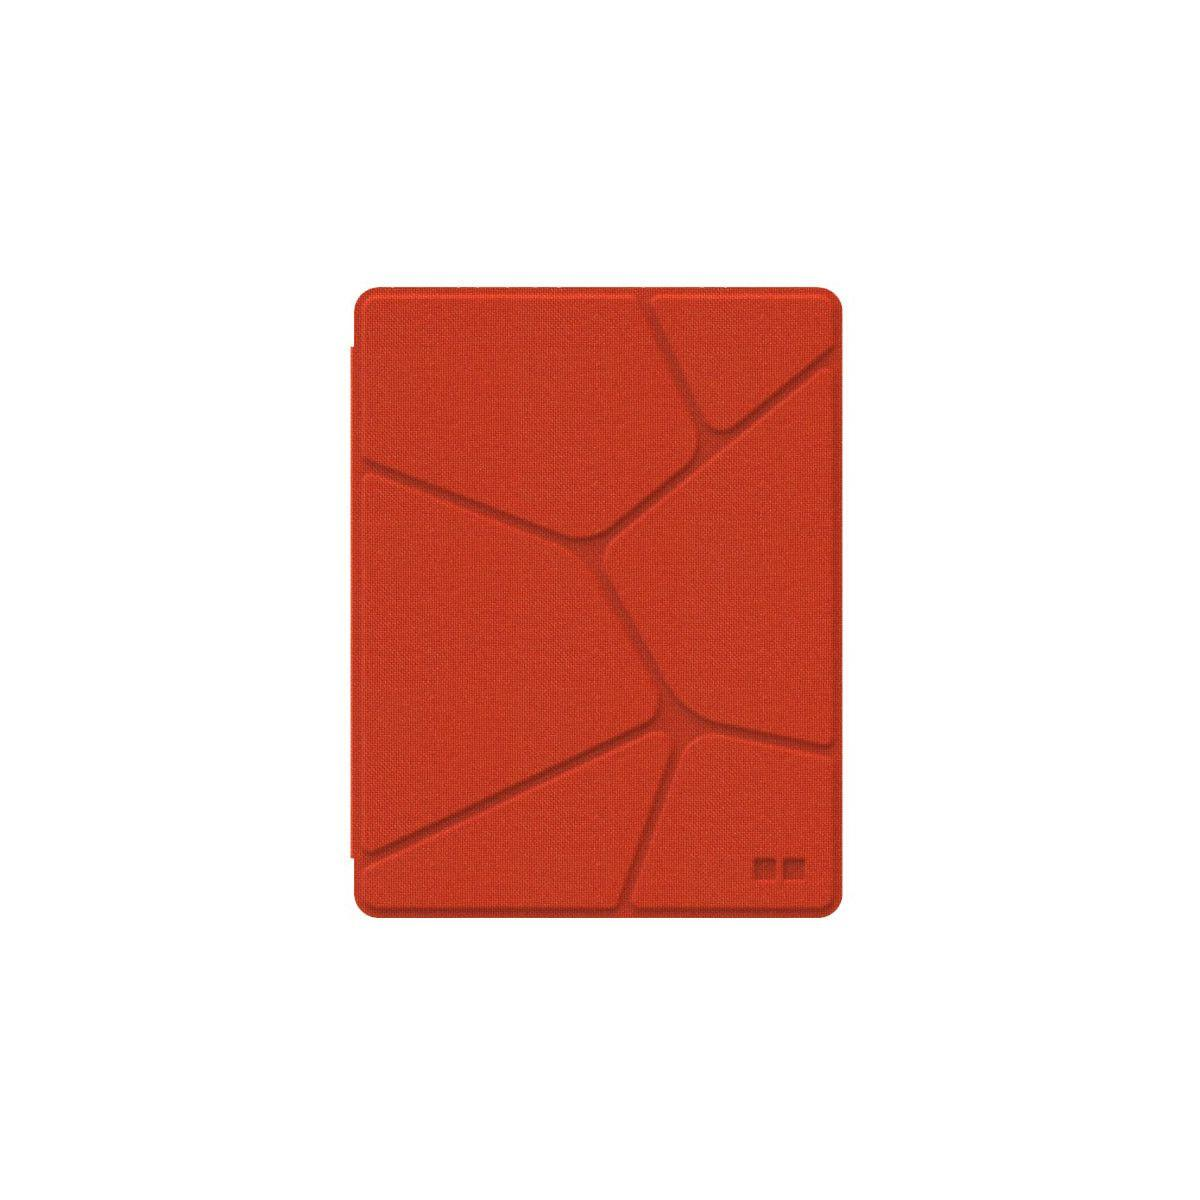 Folio ora ito ipad air rouge helene - 20% de remise imm�diate avec le code : priv20 (photo)